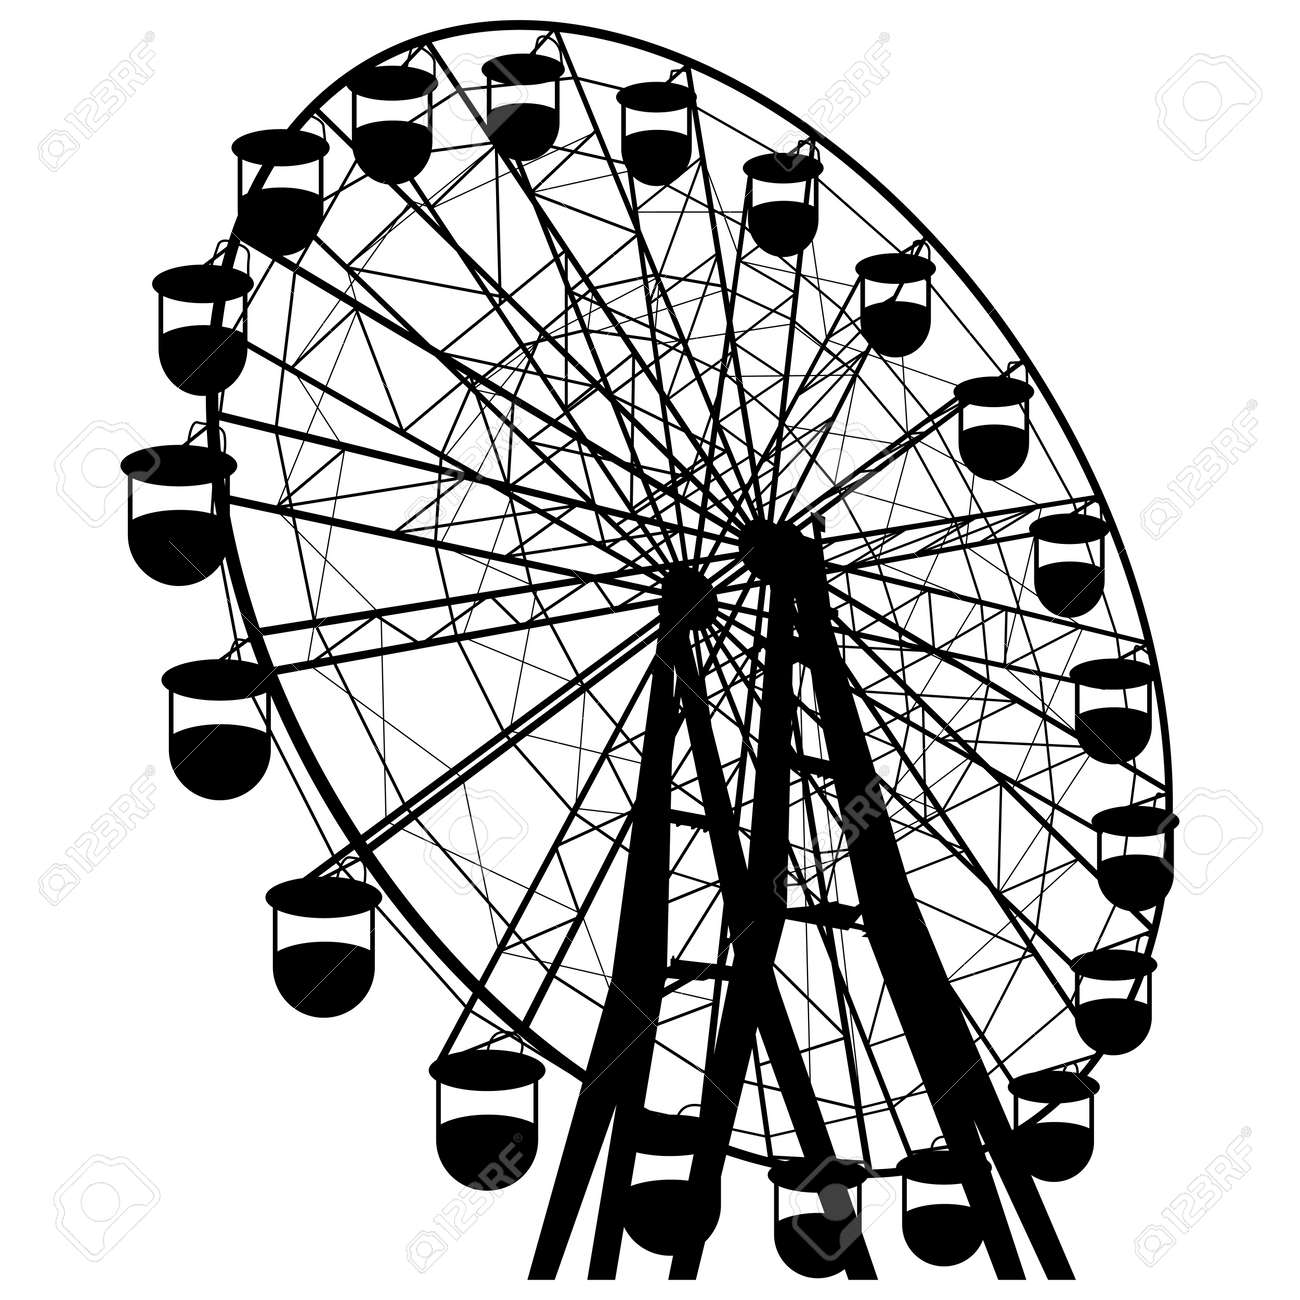 Silhouette atraktsion colorful ferris wheel. - 48523290